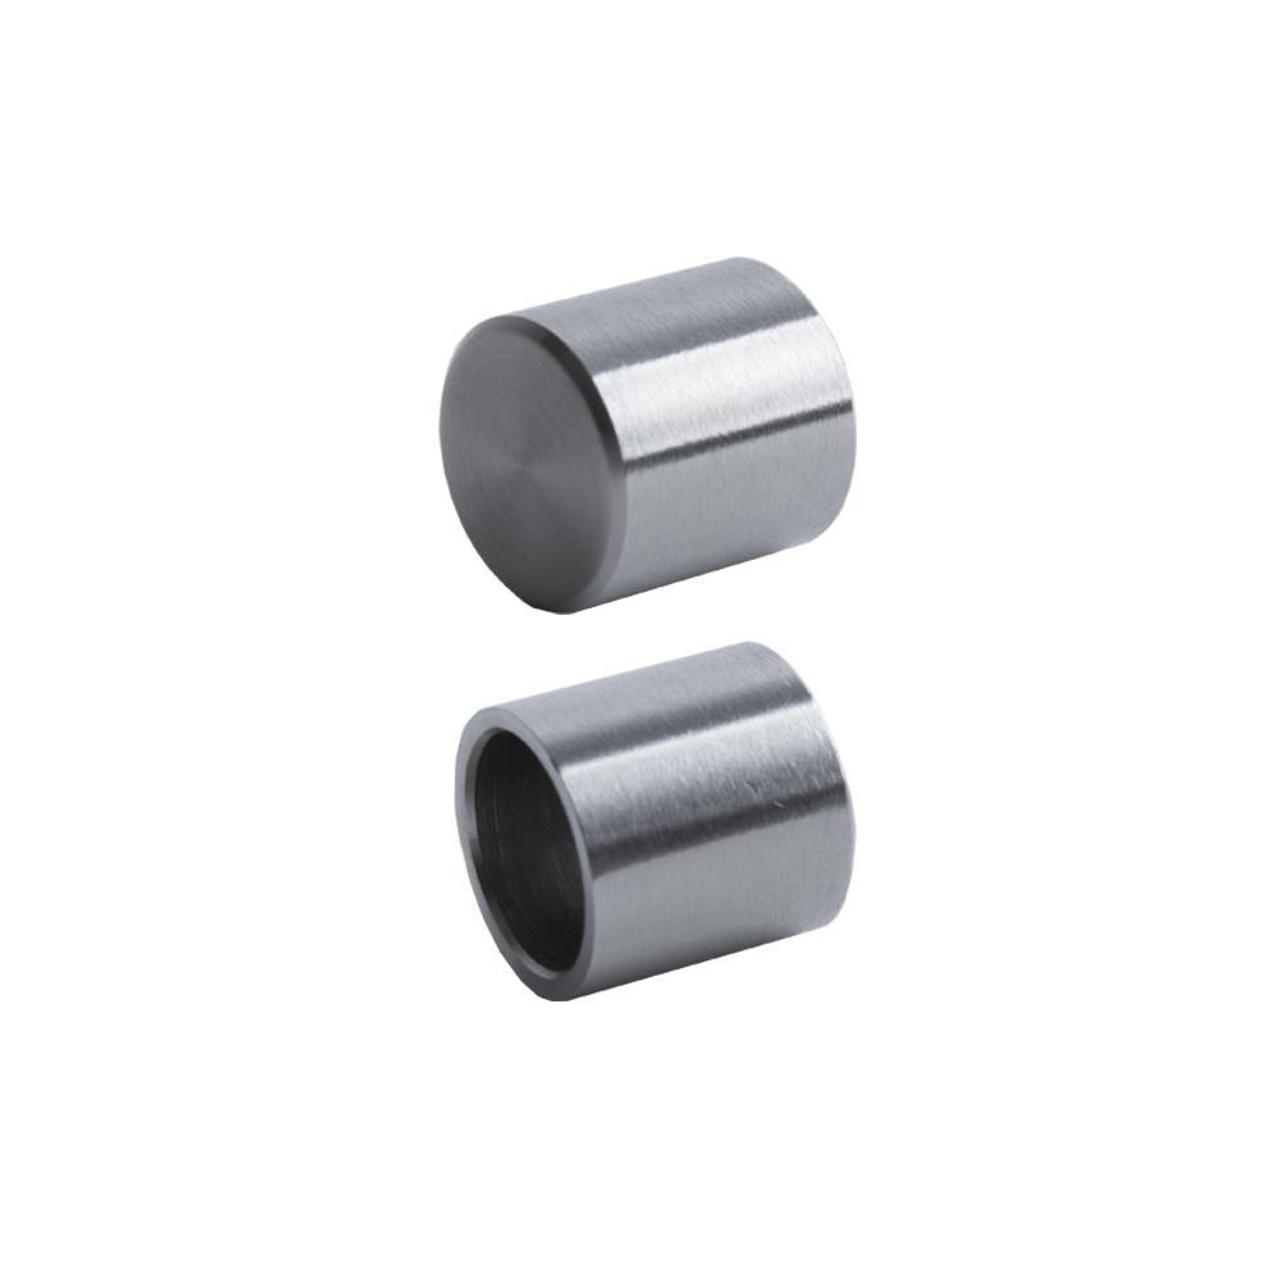 12 mm Round Bar End Cap